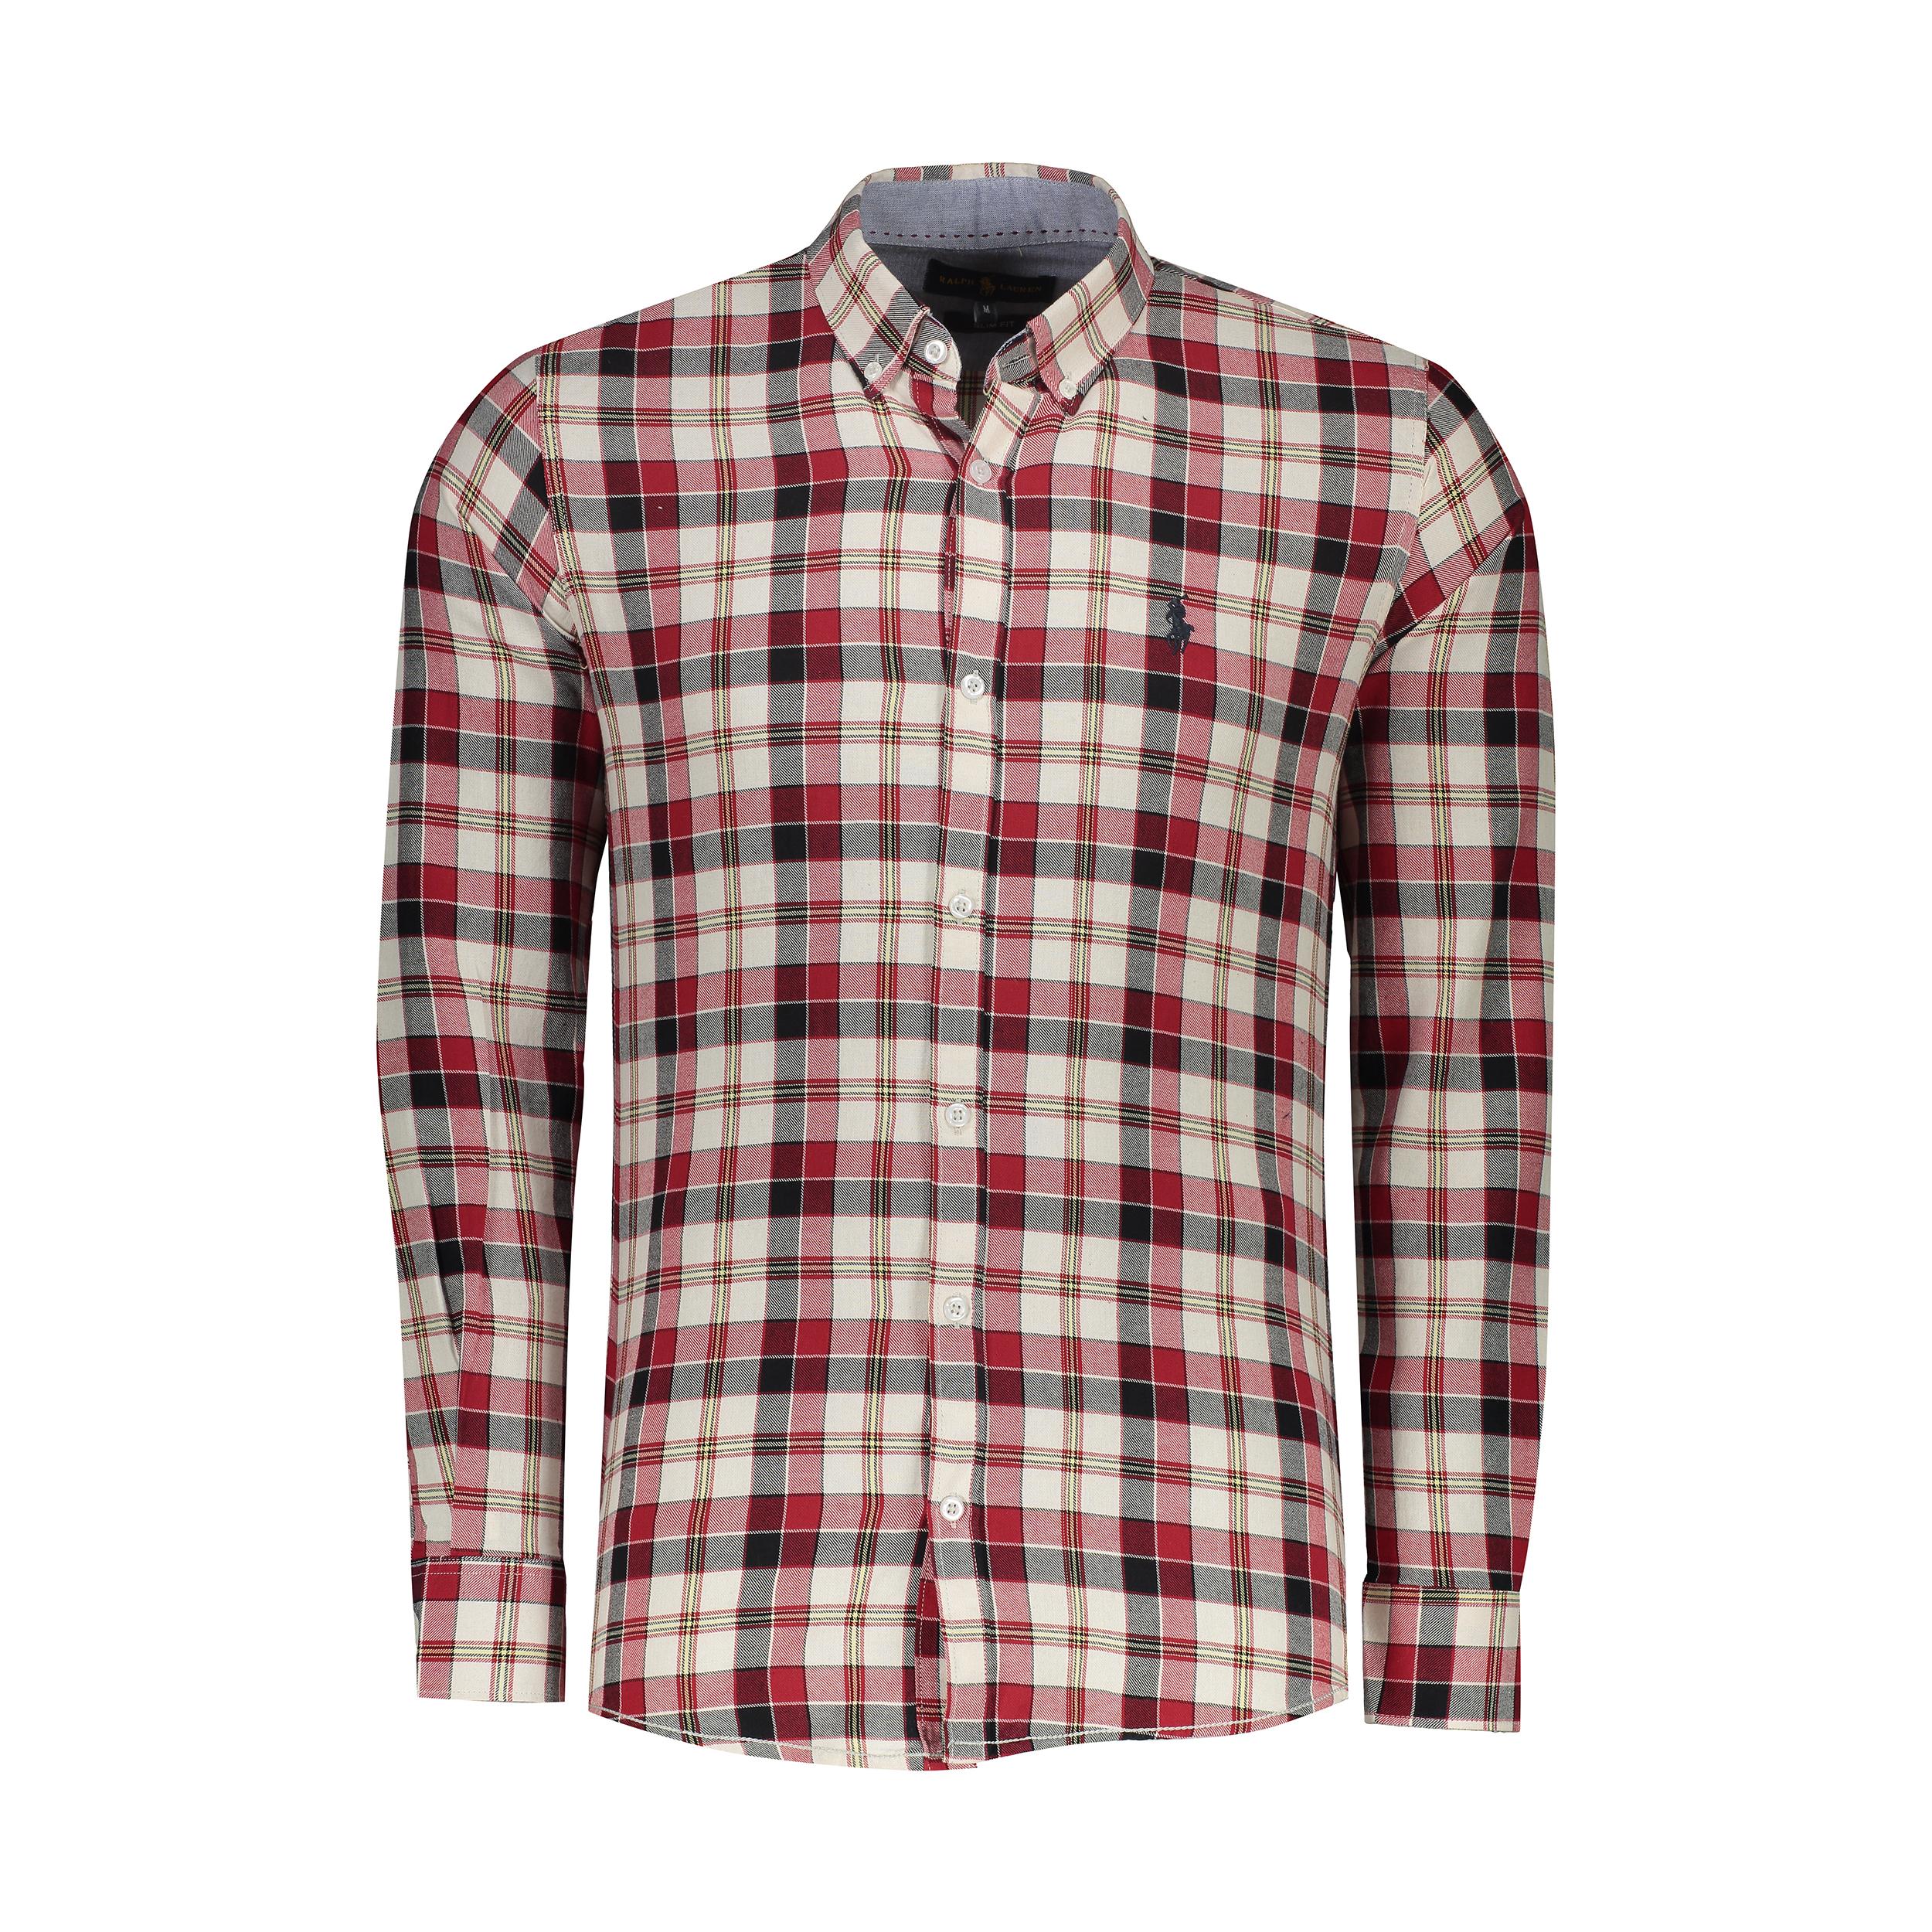 پیراهن آستین بلند مردانه پولو مدل A447